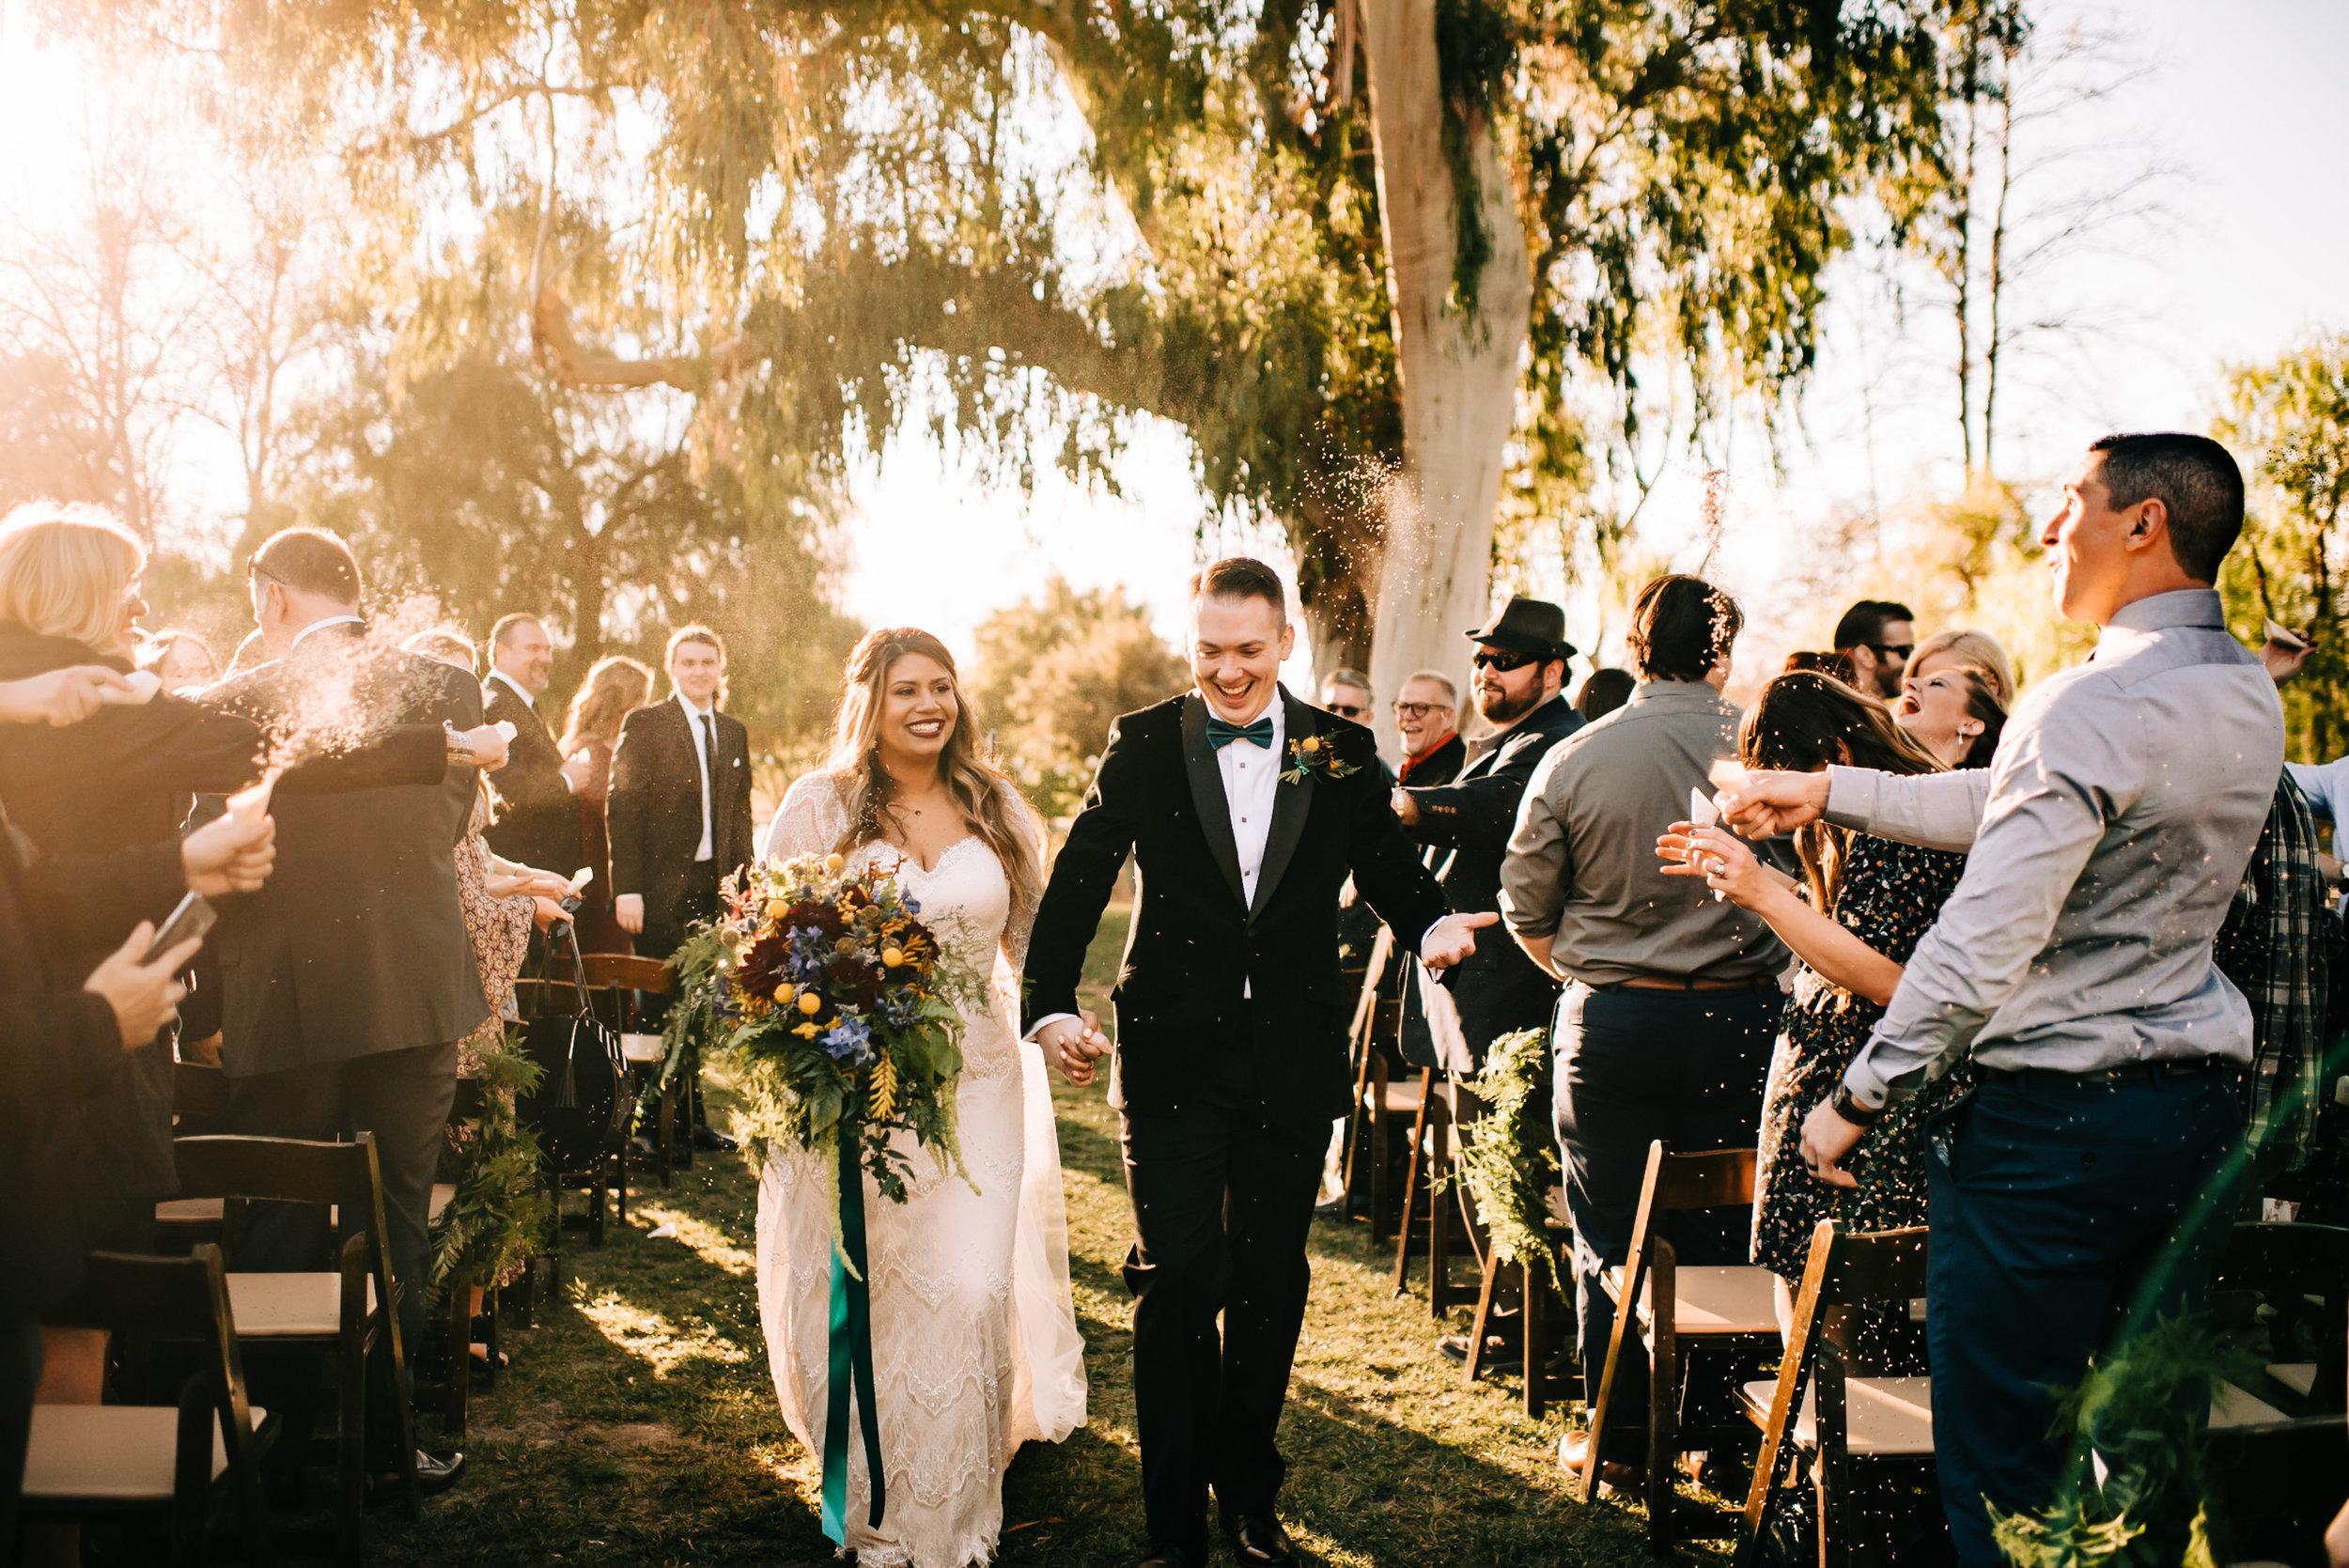 bay area nontraditional wedding photographer southern california boho wedding love light magic san francisco oakland northern california-633.jpg